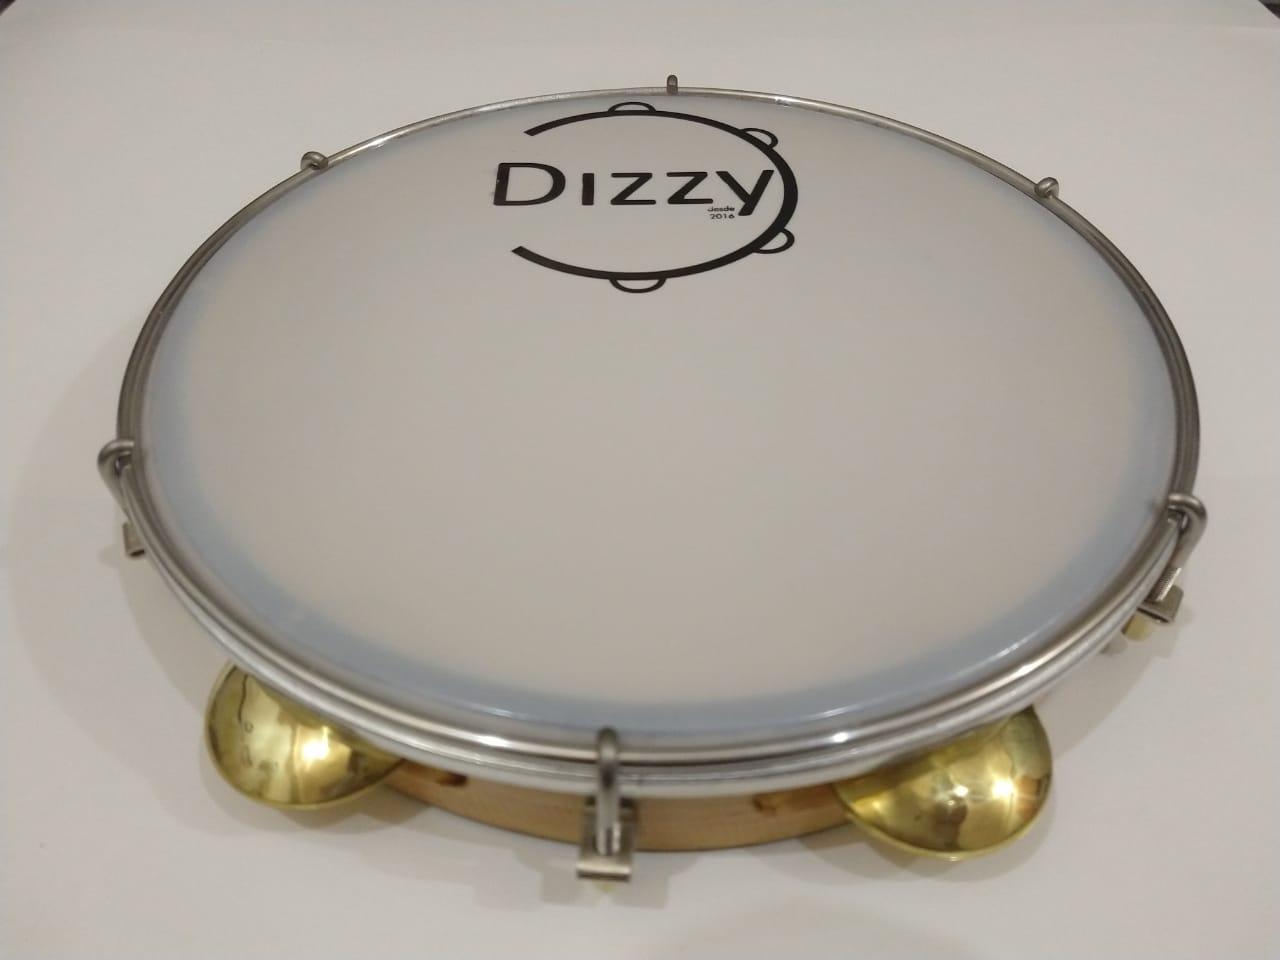 Pandeiro Dizzy 10 Pol Super Leve Marrom Claro